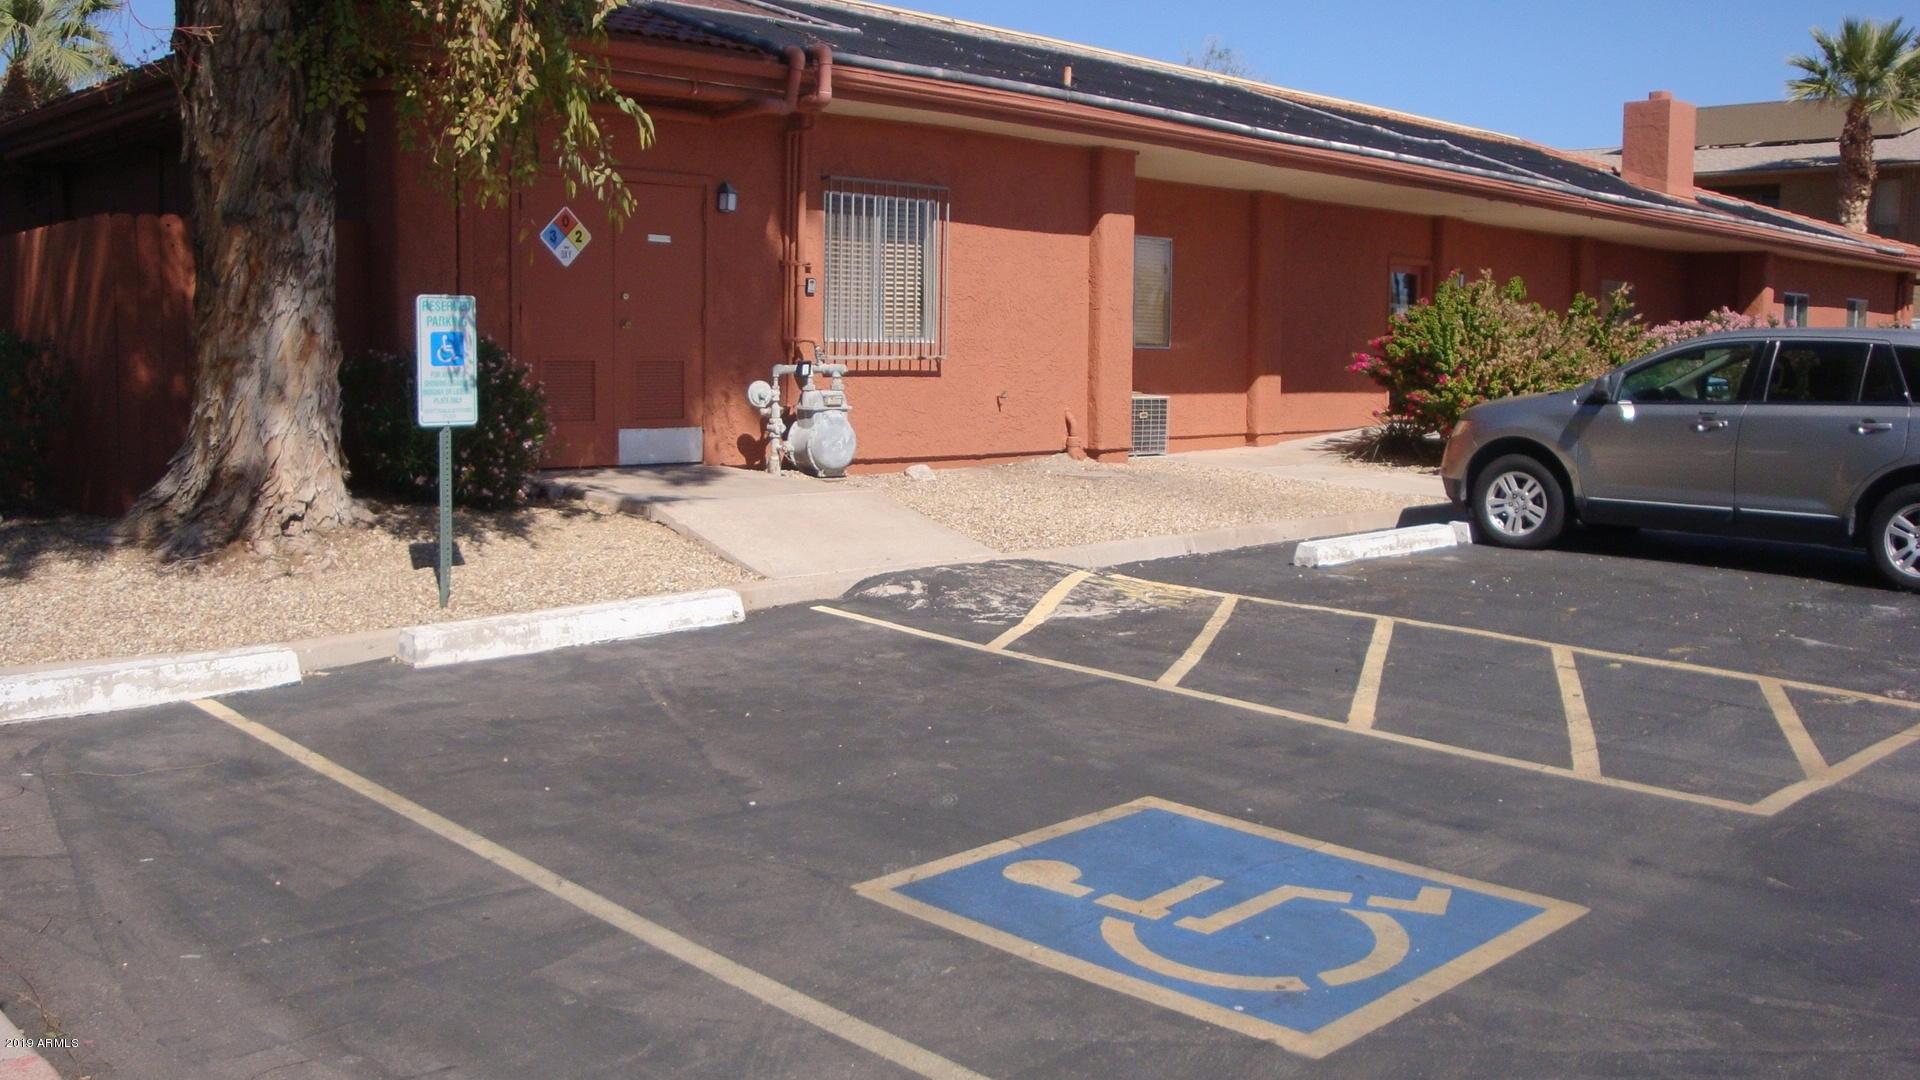 MLS 5882786 4354 N 82ND Street Unit 255, Scottsdale, AZ 85251 Scottsdale AZ Old Town Scottsdale